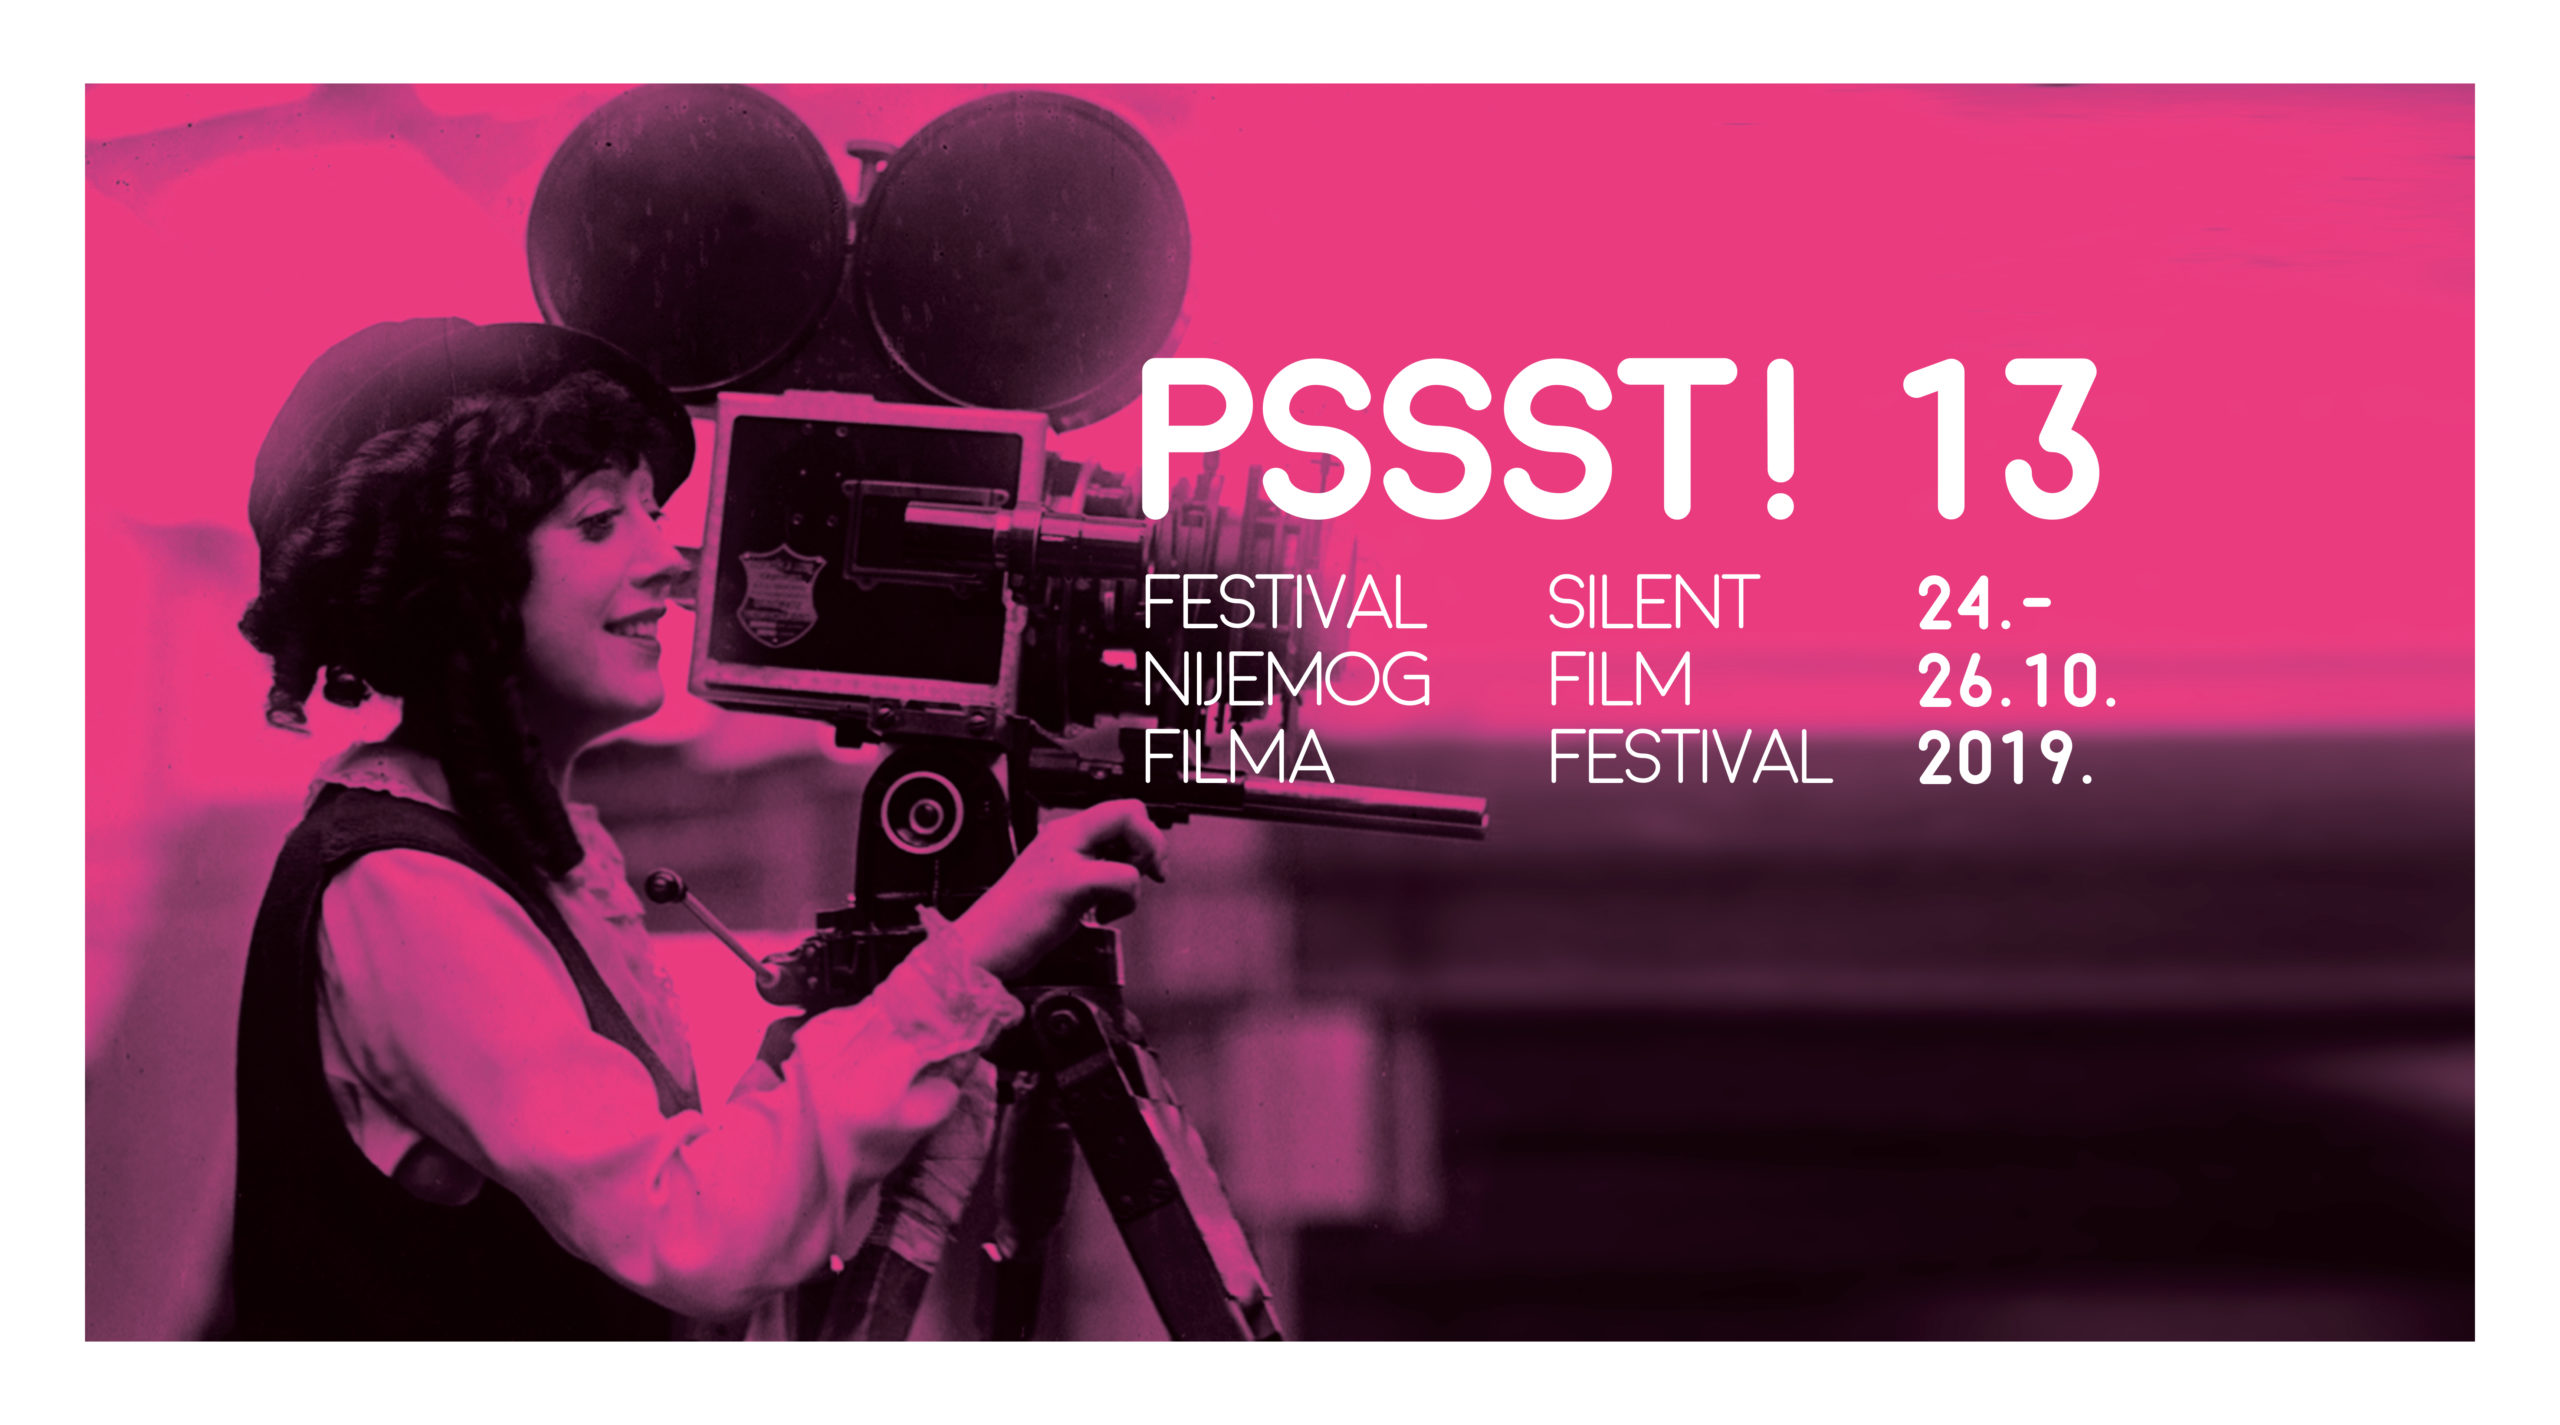 Svečanom dodjelom nagrada završio 13. PSSST! Festival nijemog filma